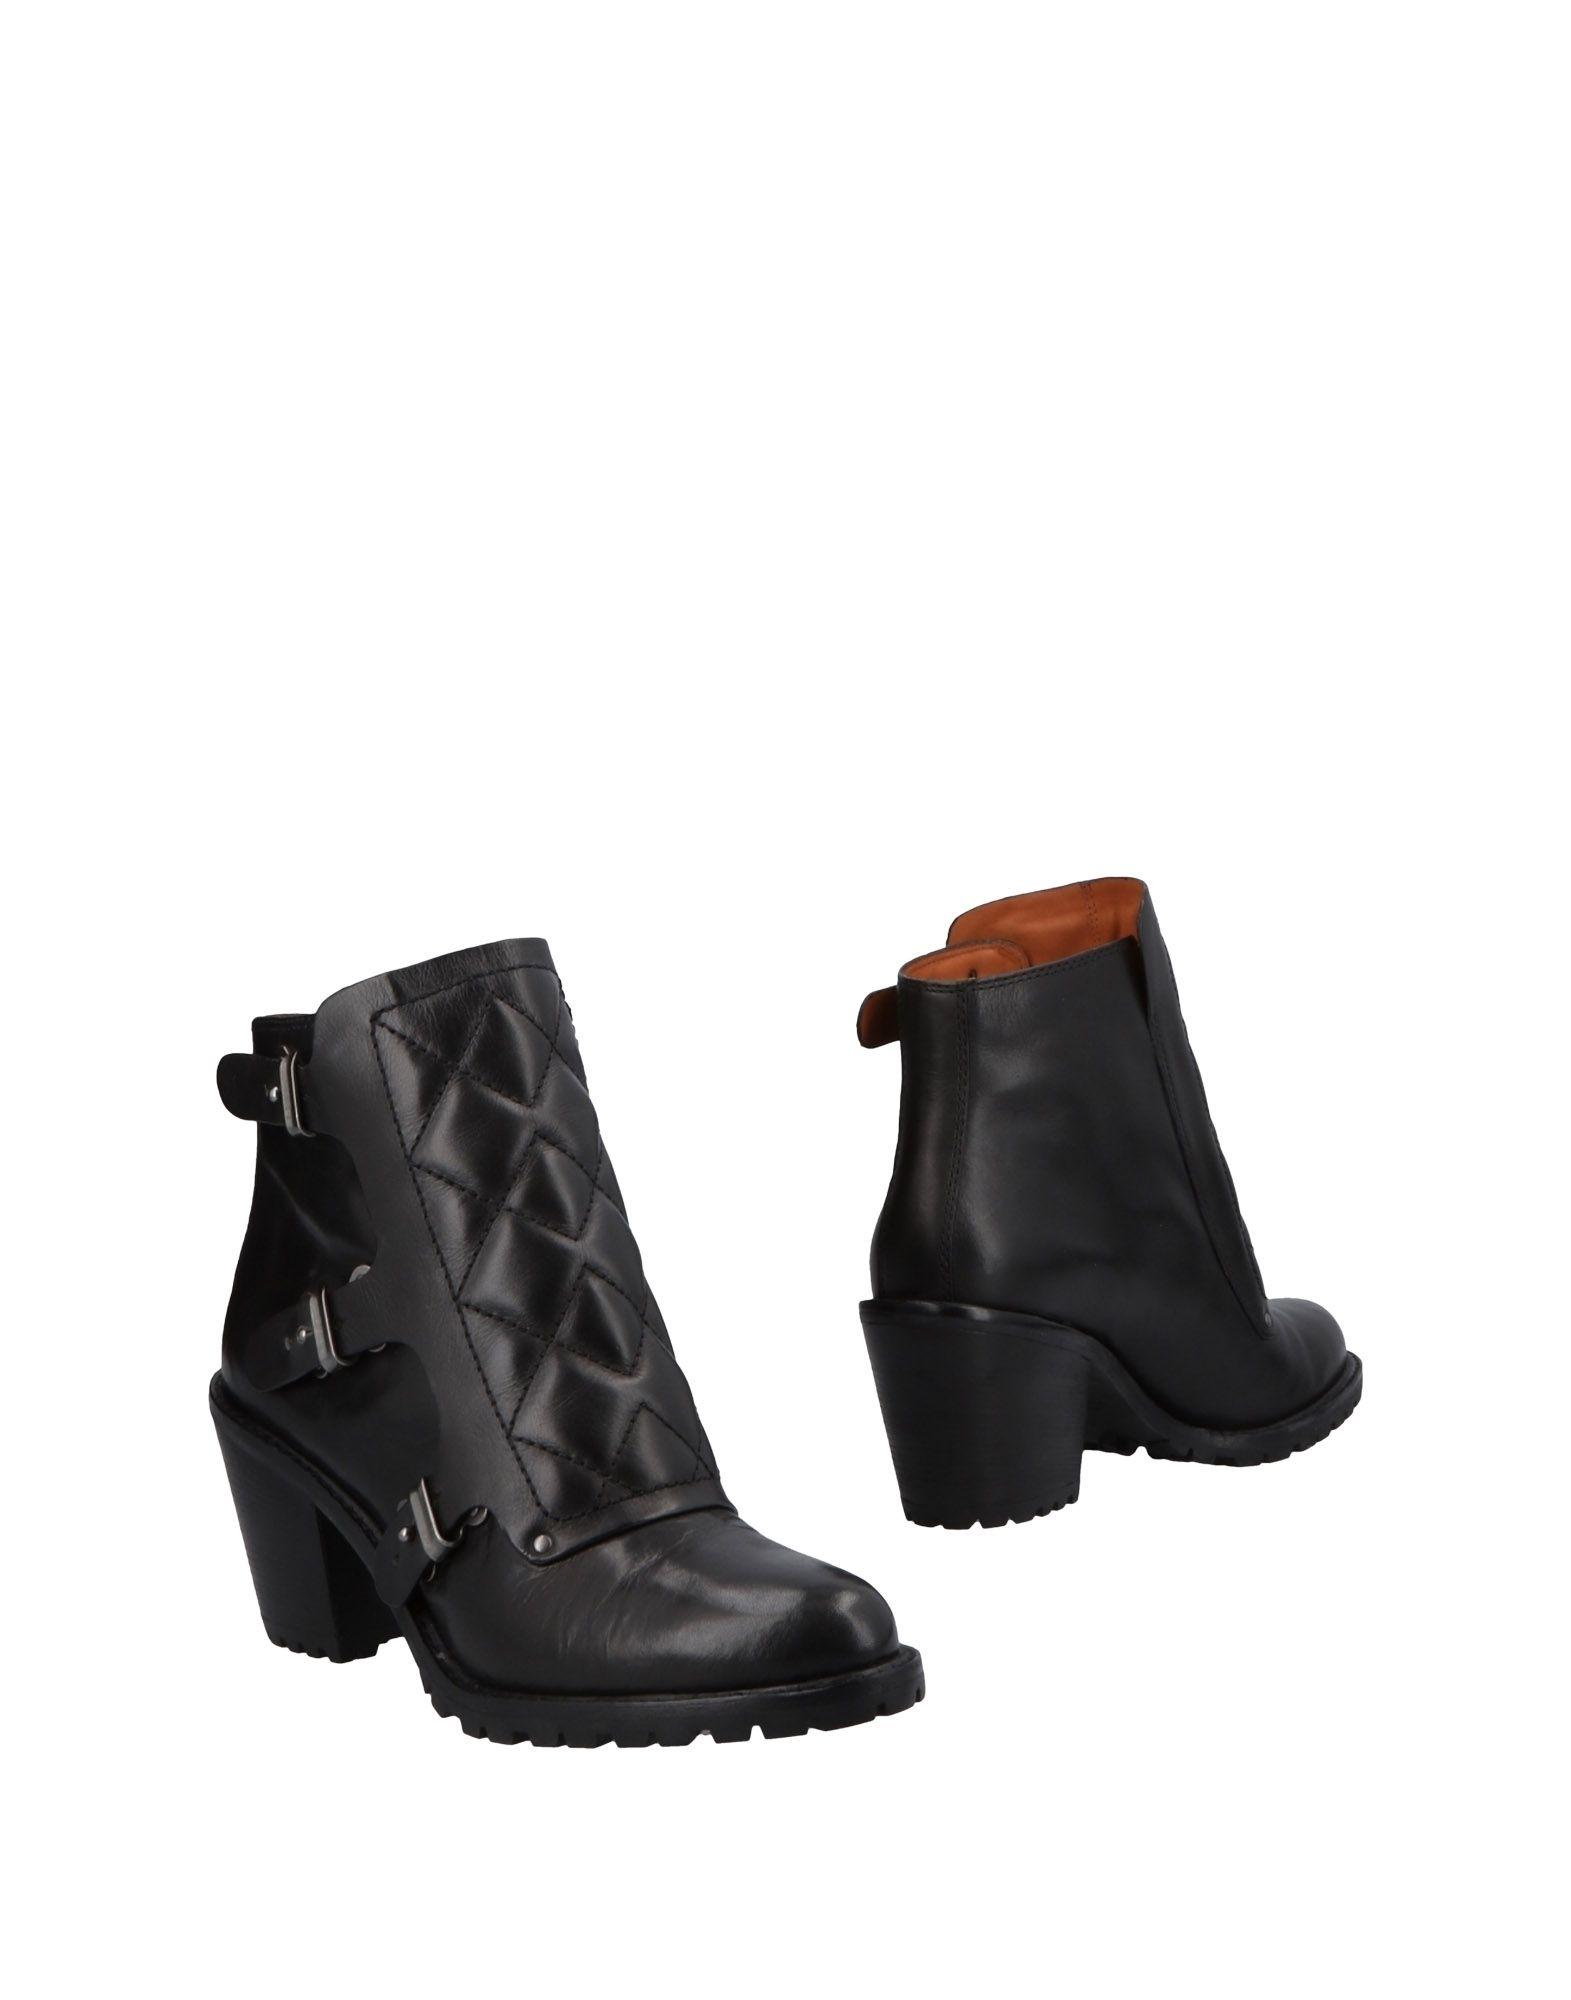 Marc By Marc Jacobs Stiefelette Damen Schuhe  11482296KEGünstige gut aussehende Schuhe Damen 58795f